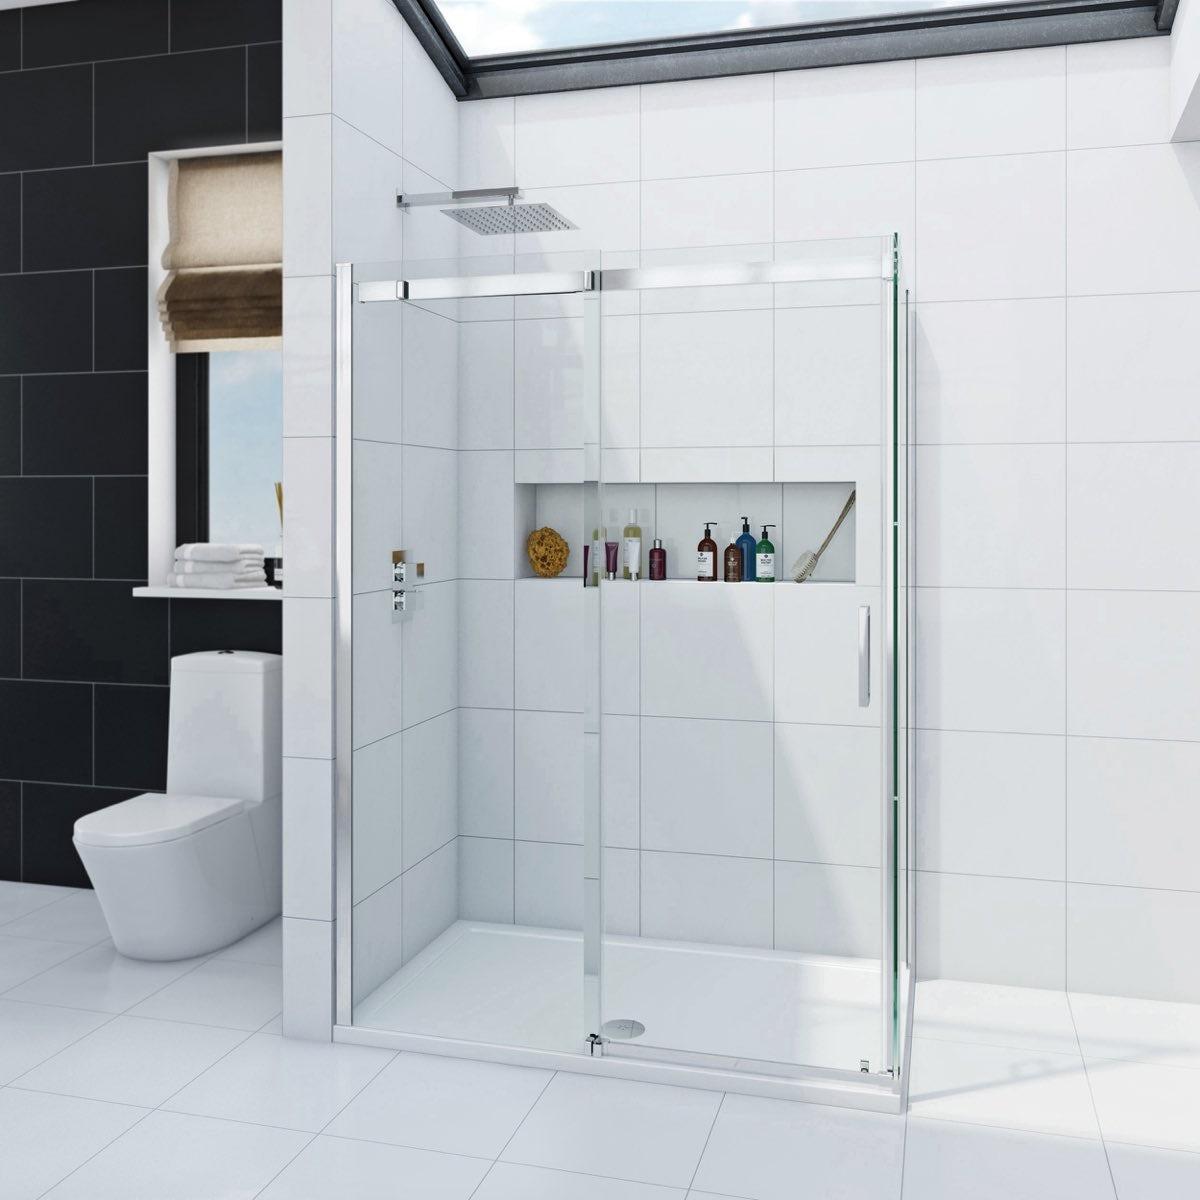 Mode Infiniti 8mm sliding door shower enclosure 1400 x 800